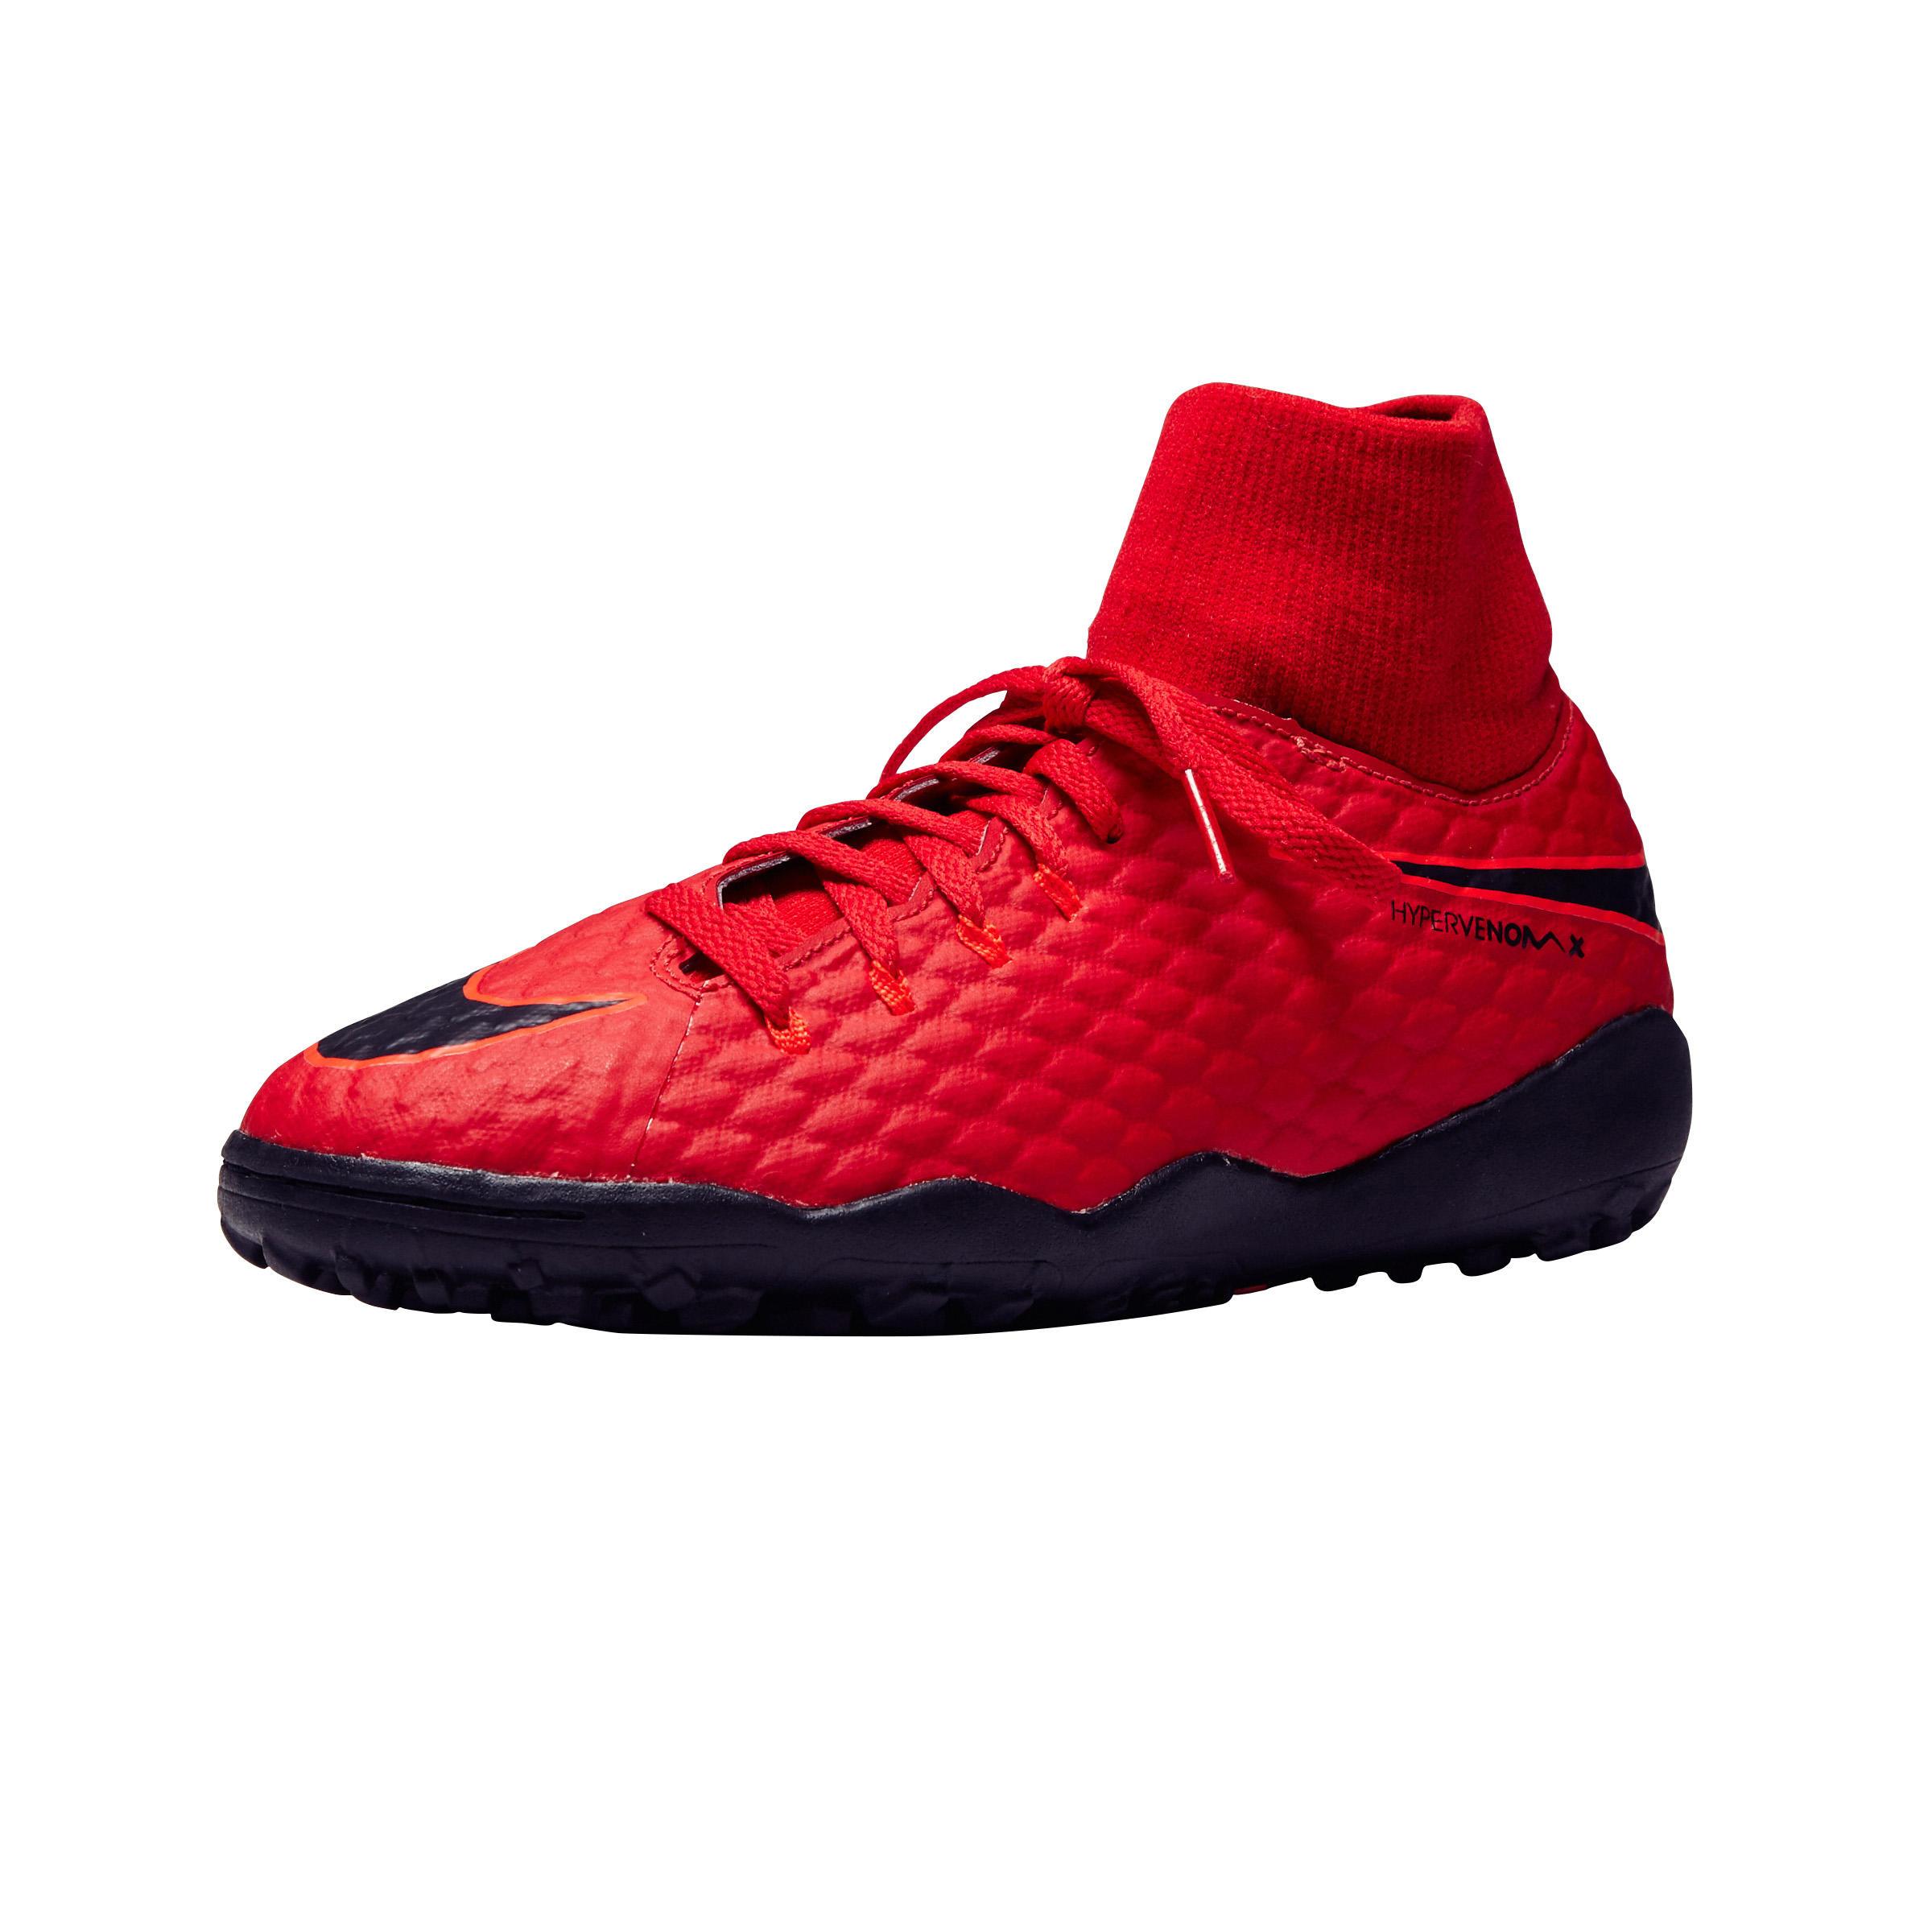 Nike Voetbalschoenen kind Hypervenom X Dynamic Fit TF rood